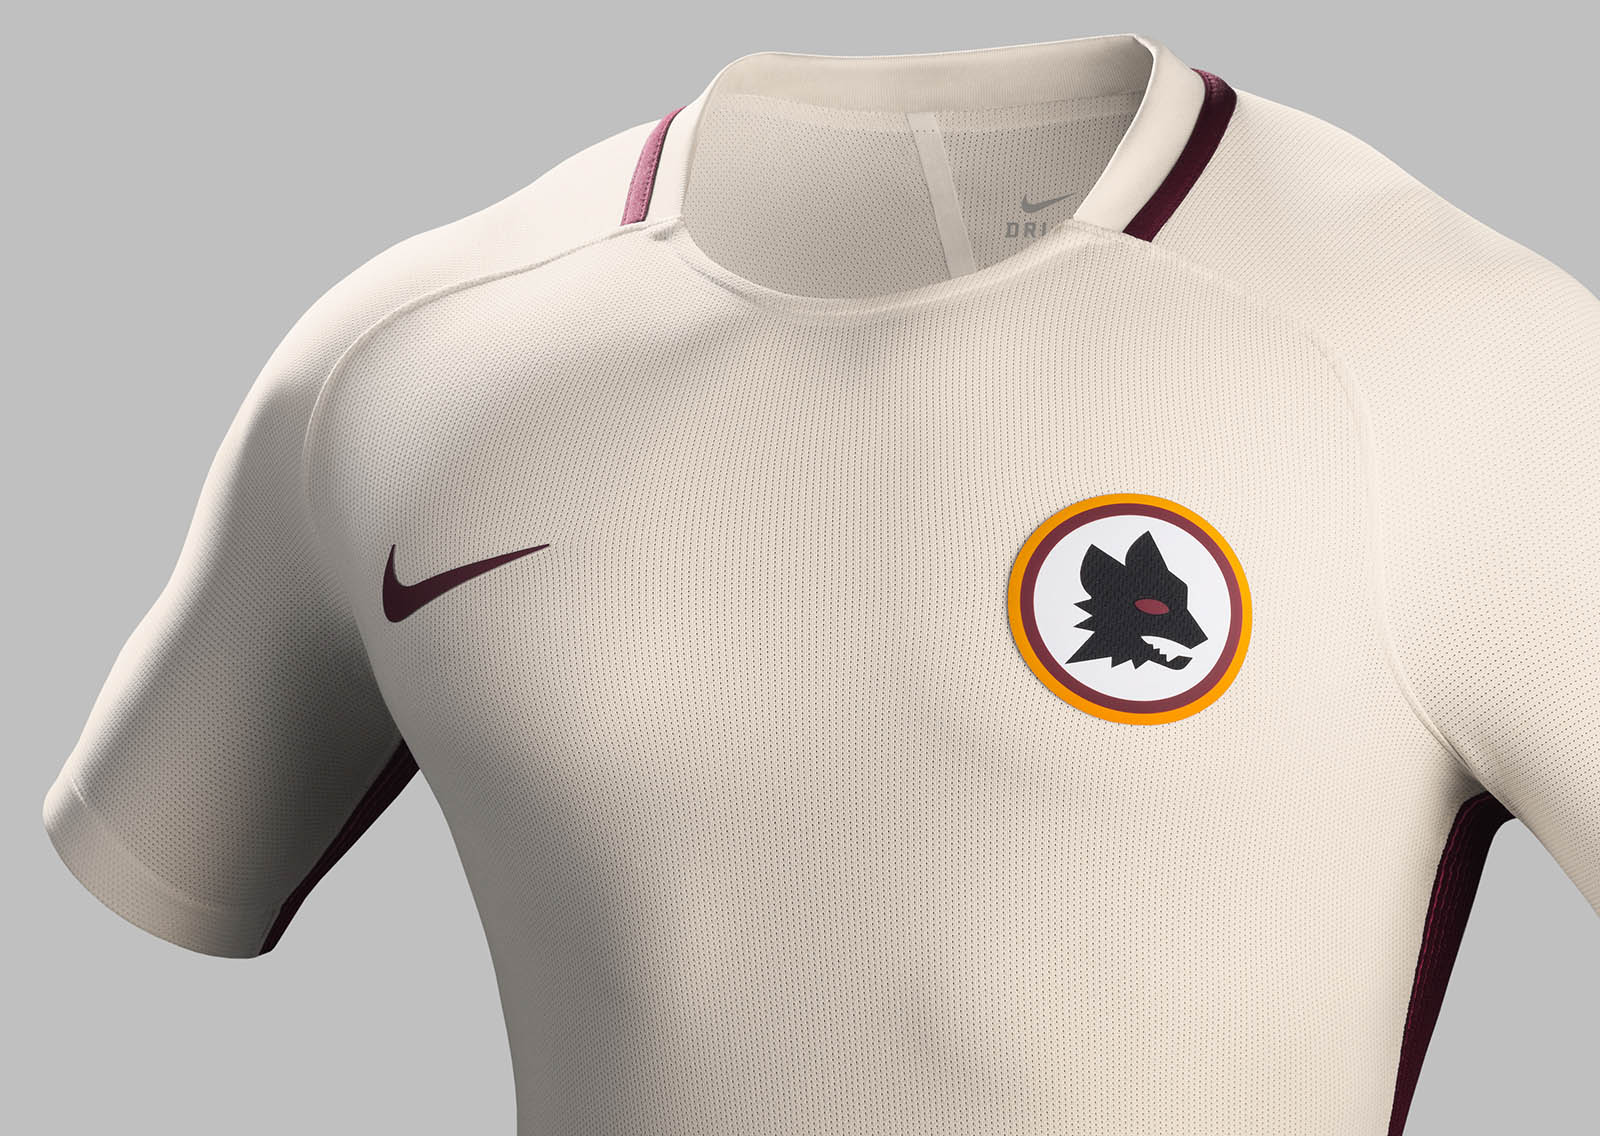 as-roma-16-17-third-kit front